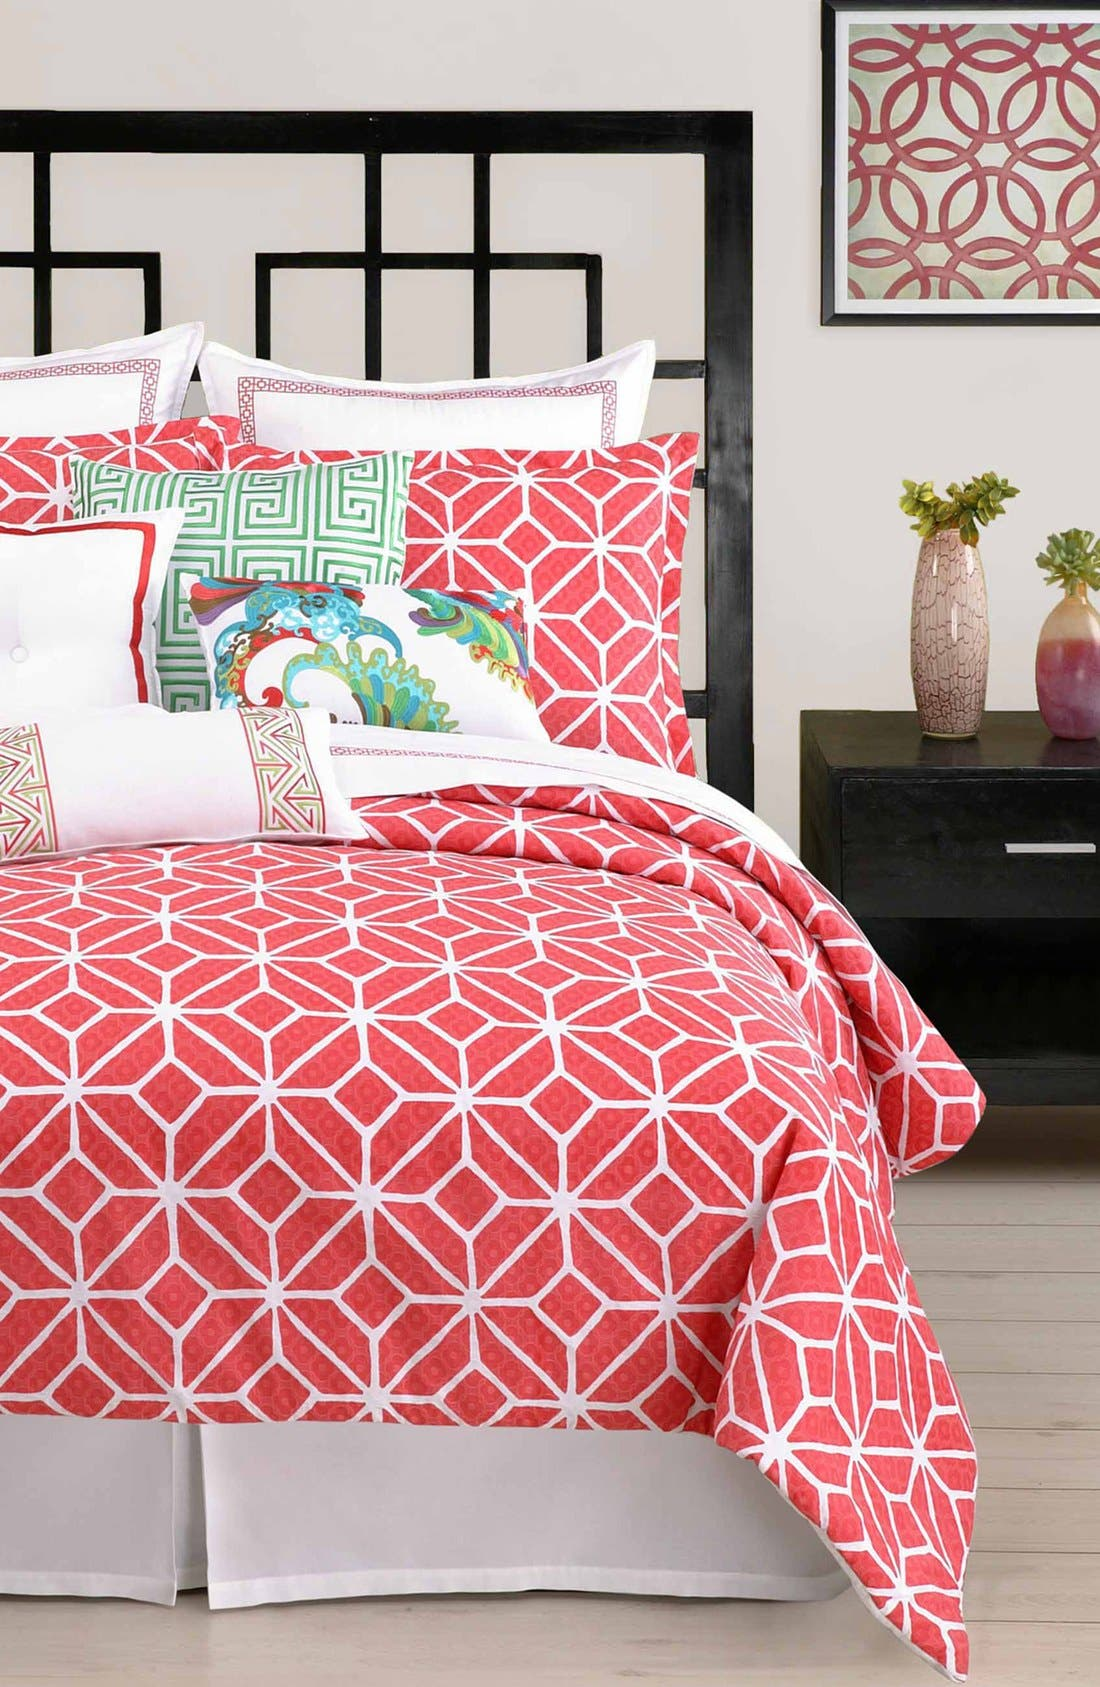 Main Image - Trina Turk 'Trellis' Comforter & Shams